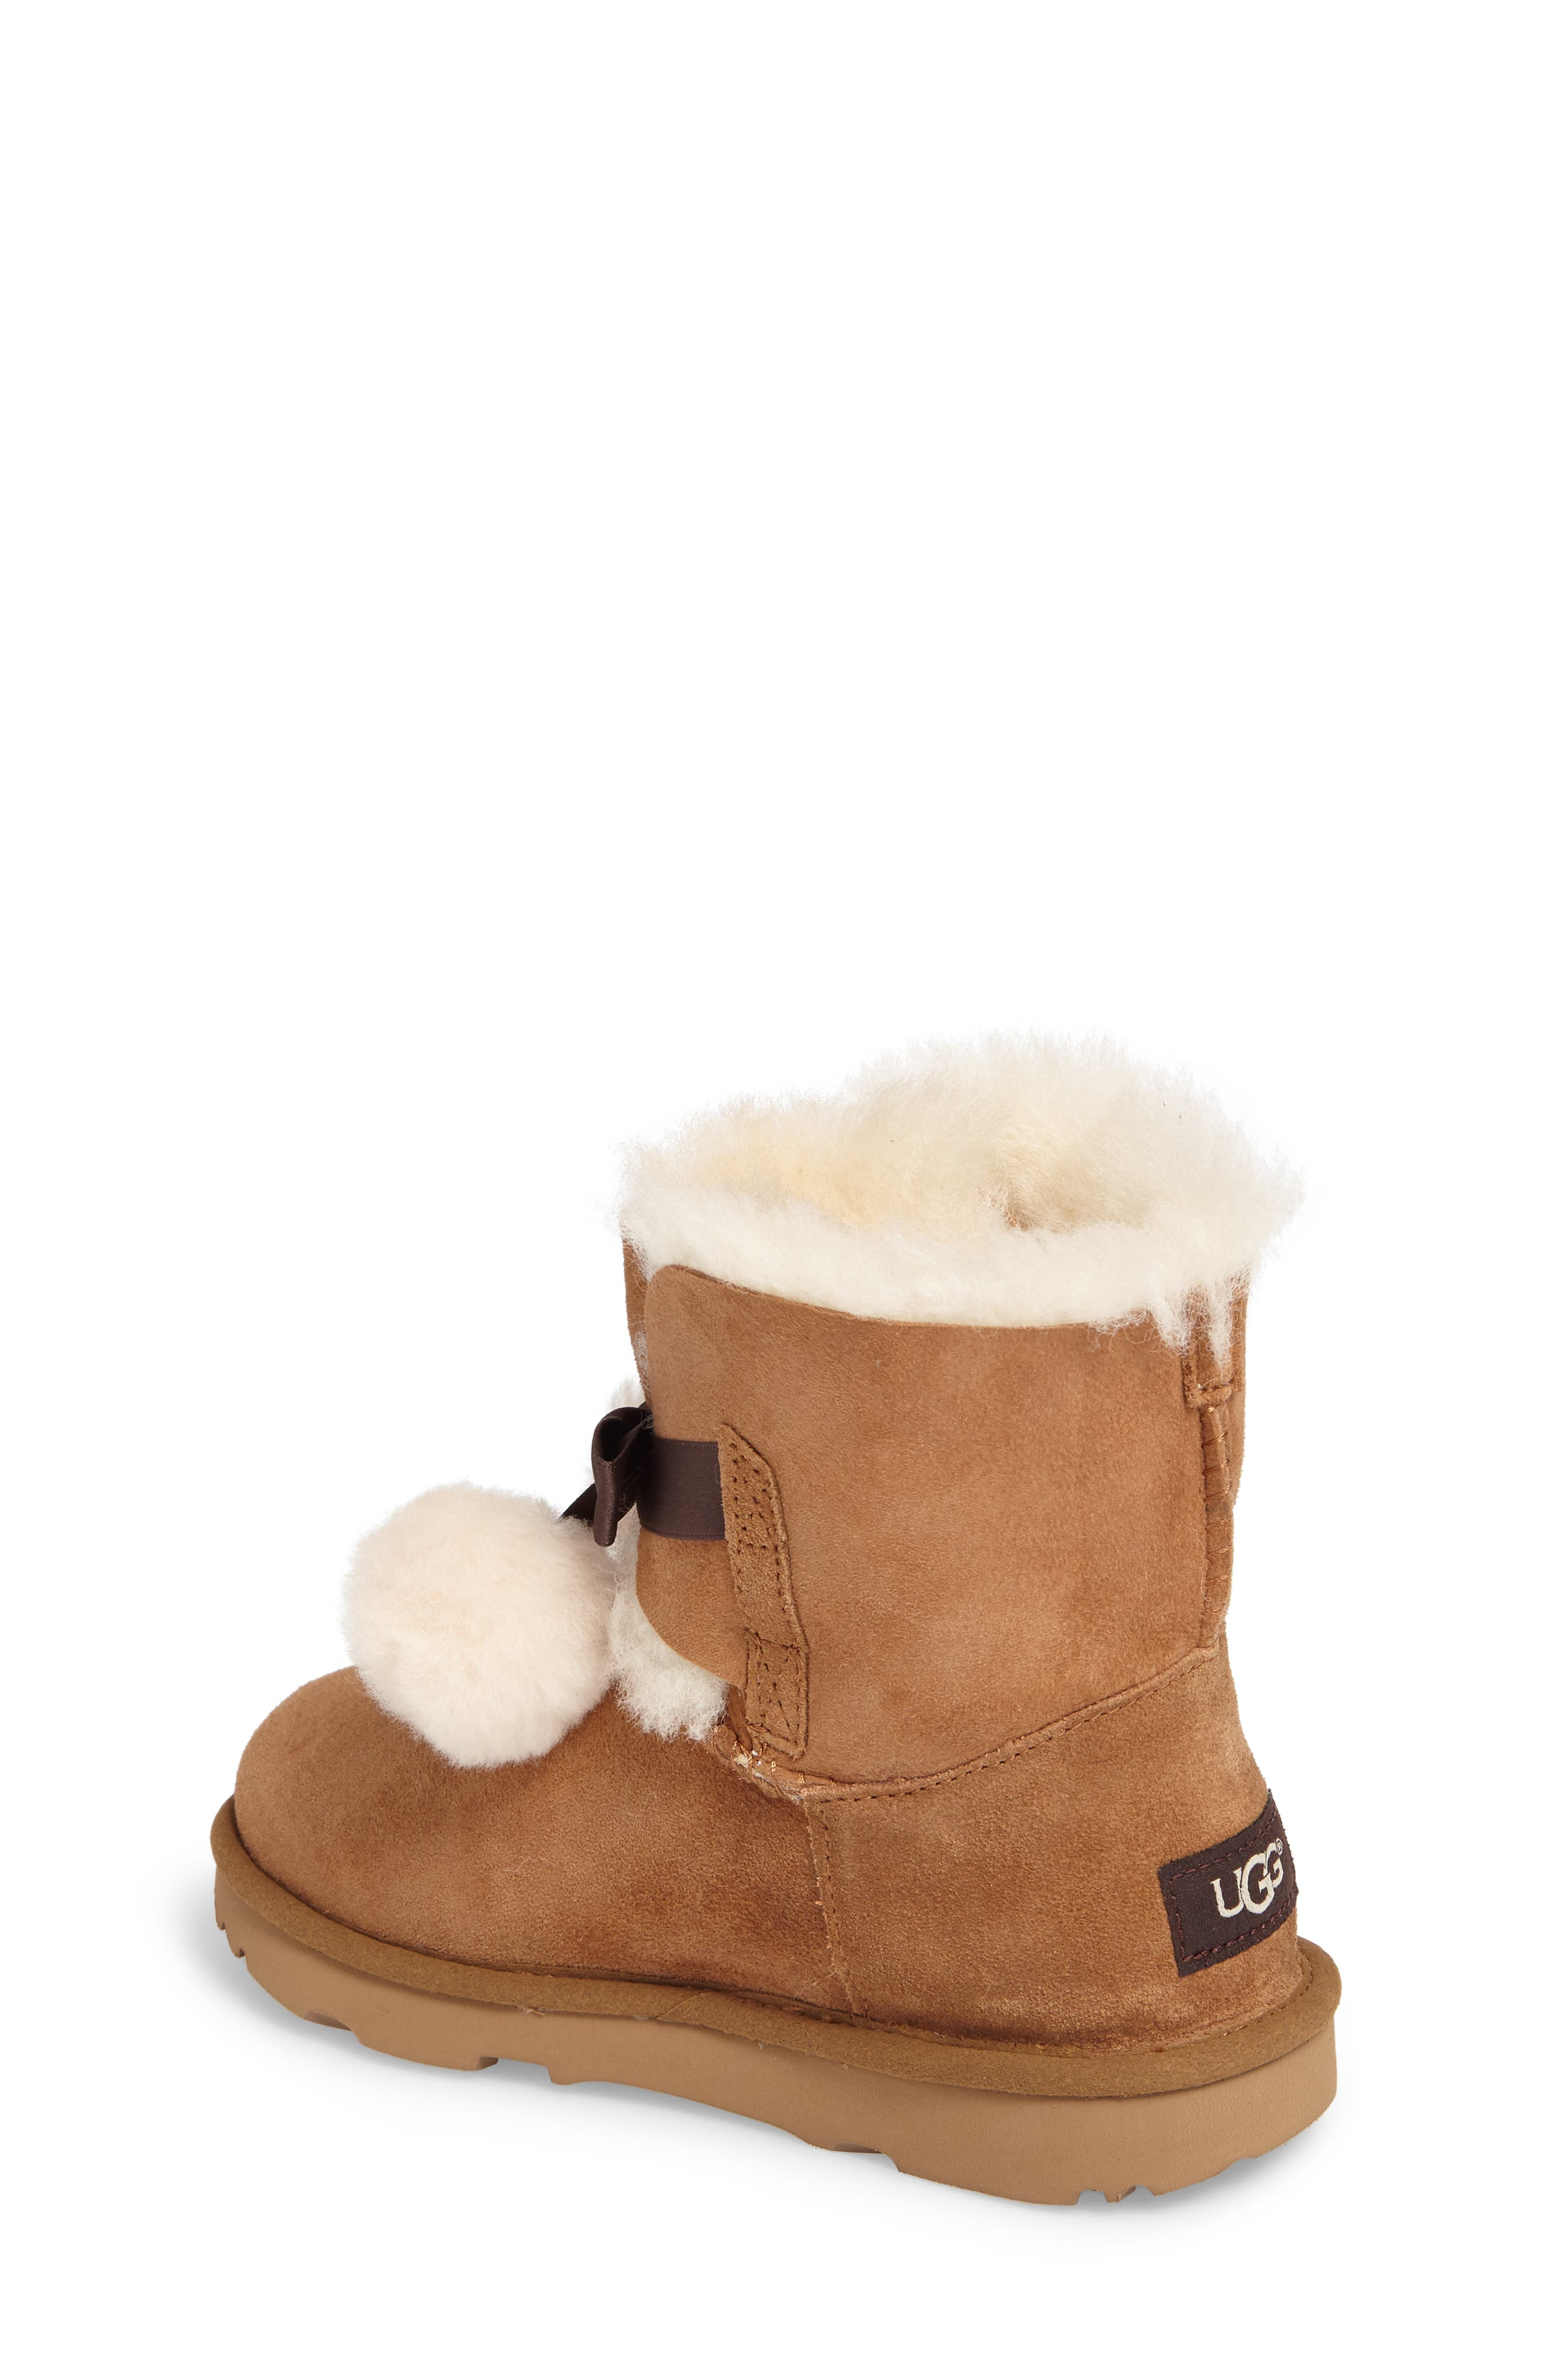 Gita Water-Resistant Genuine Shearling Pom Boot,                             Alternate thumbnail 2, color,                             CHESTNUT